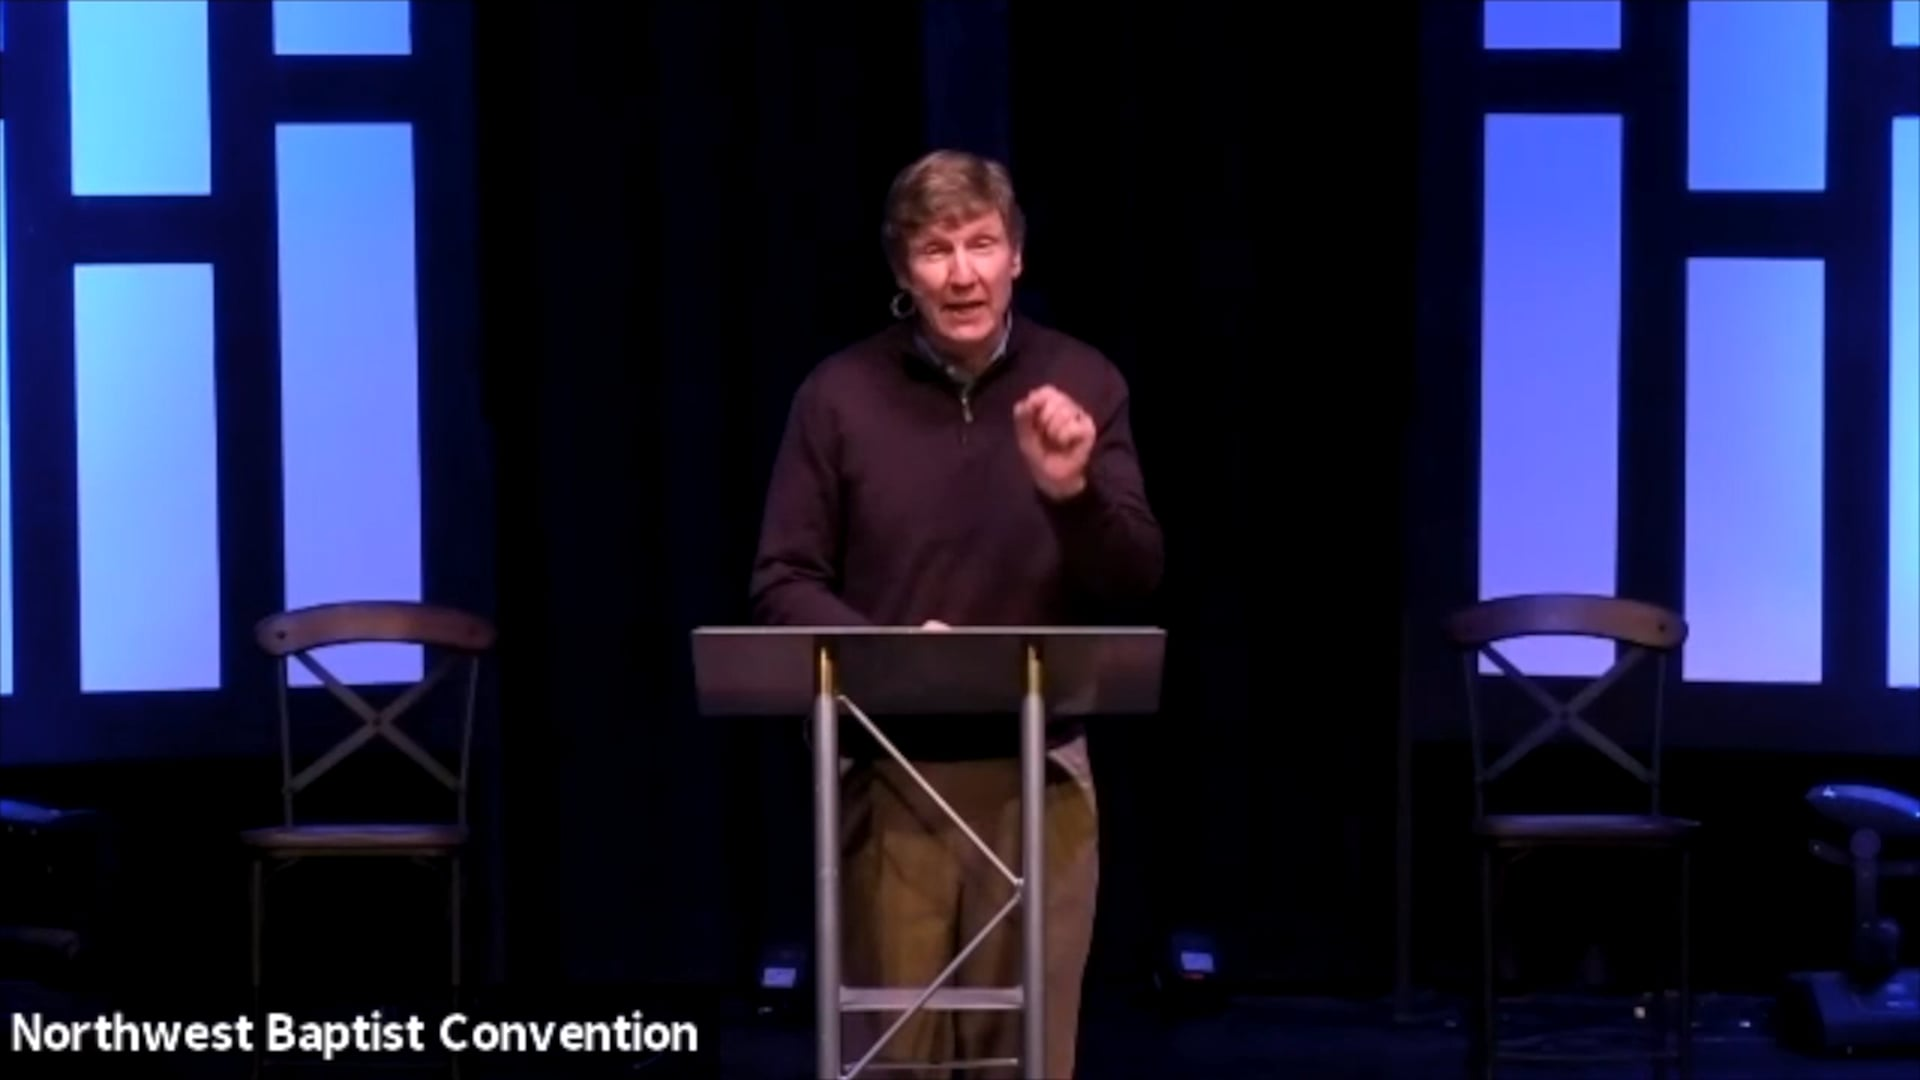 Randy Adams - 2020 Annual Meeting